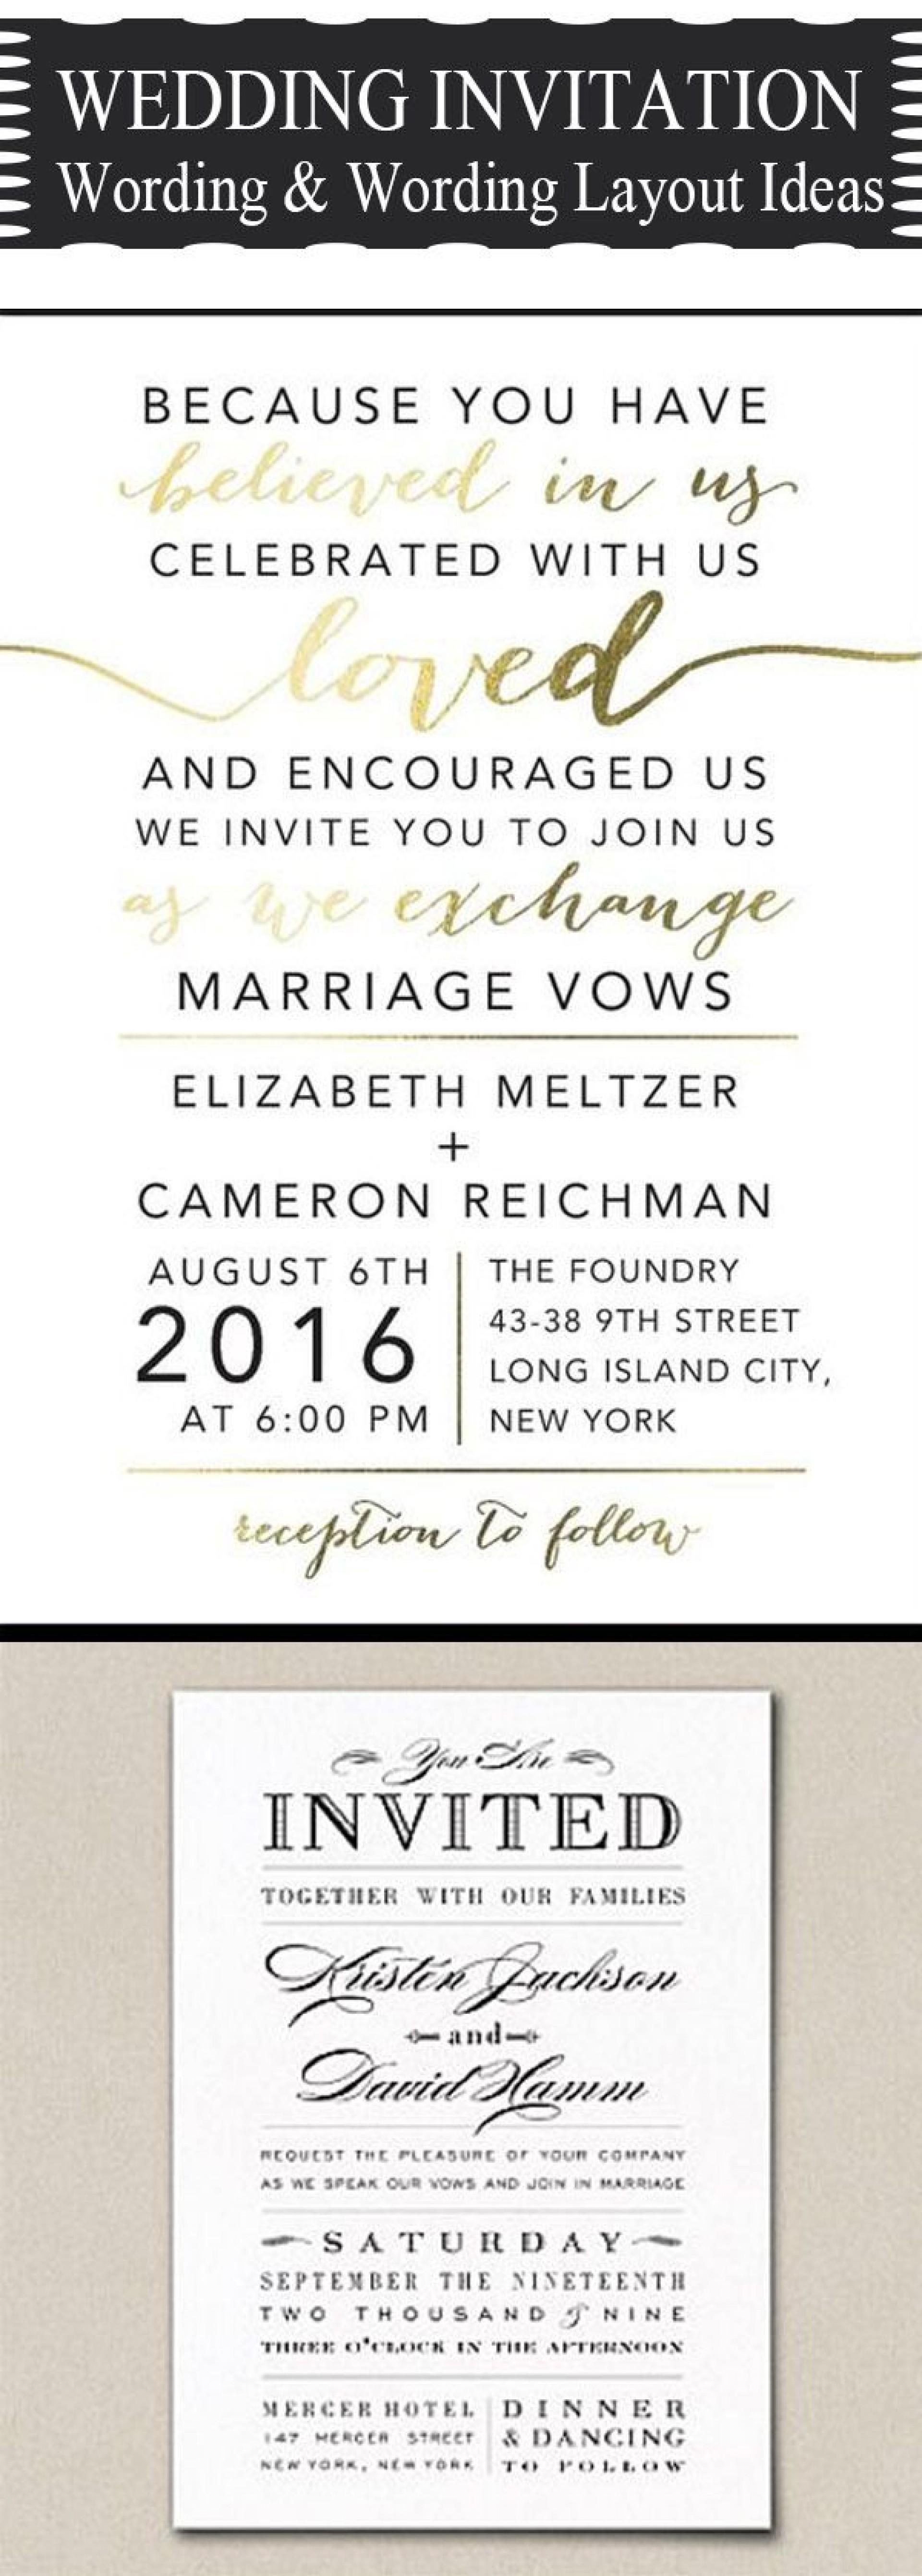 007 Rare Formal Wedding Invitation Wording Template Sample  Templates1920